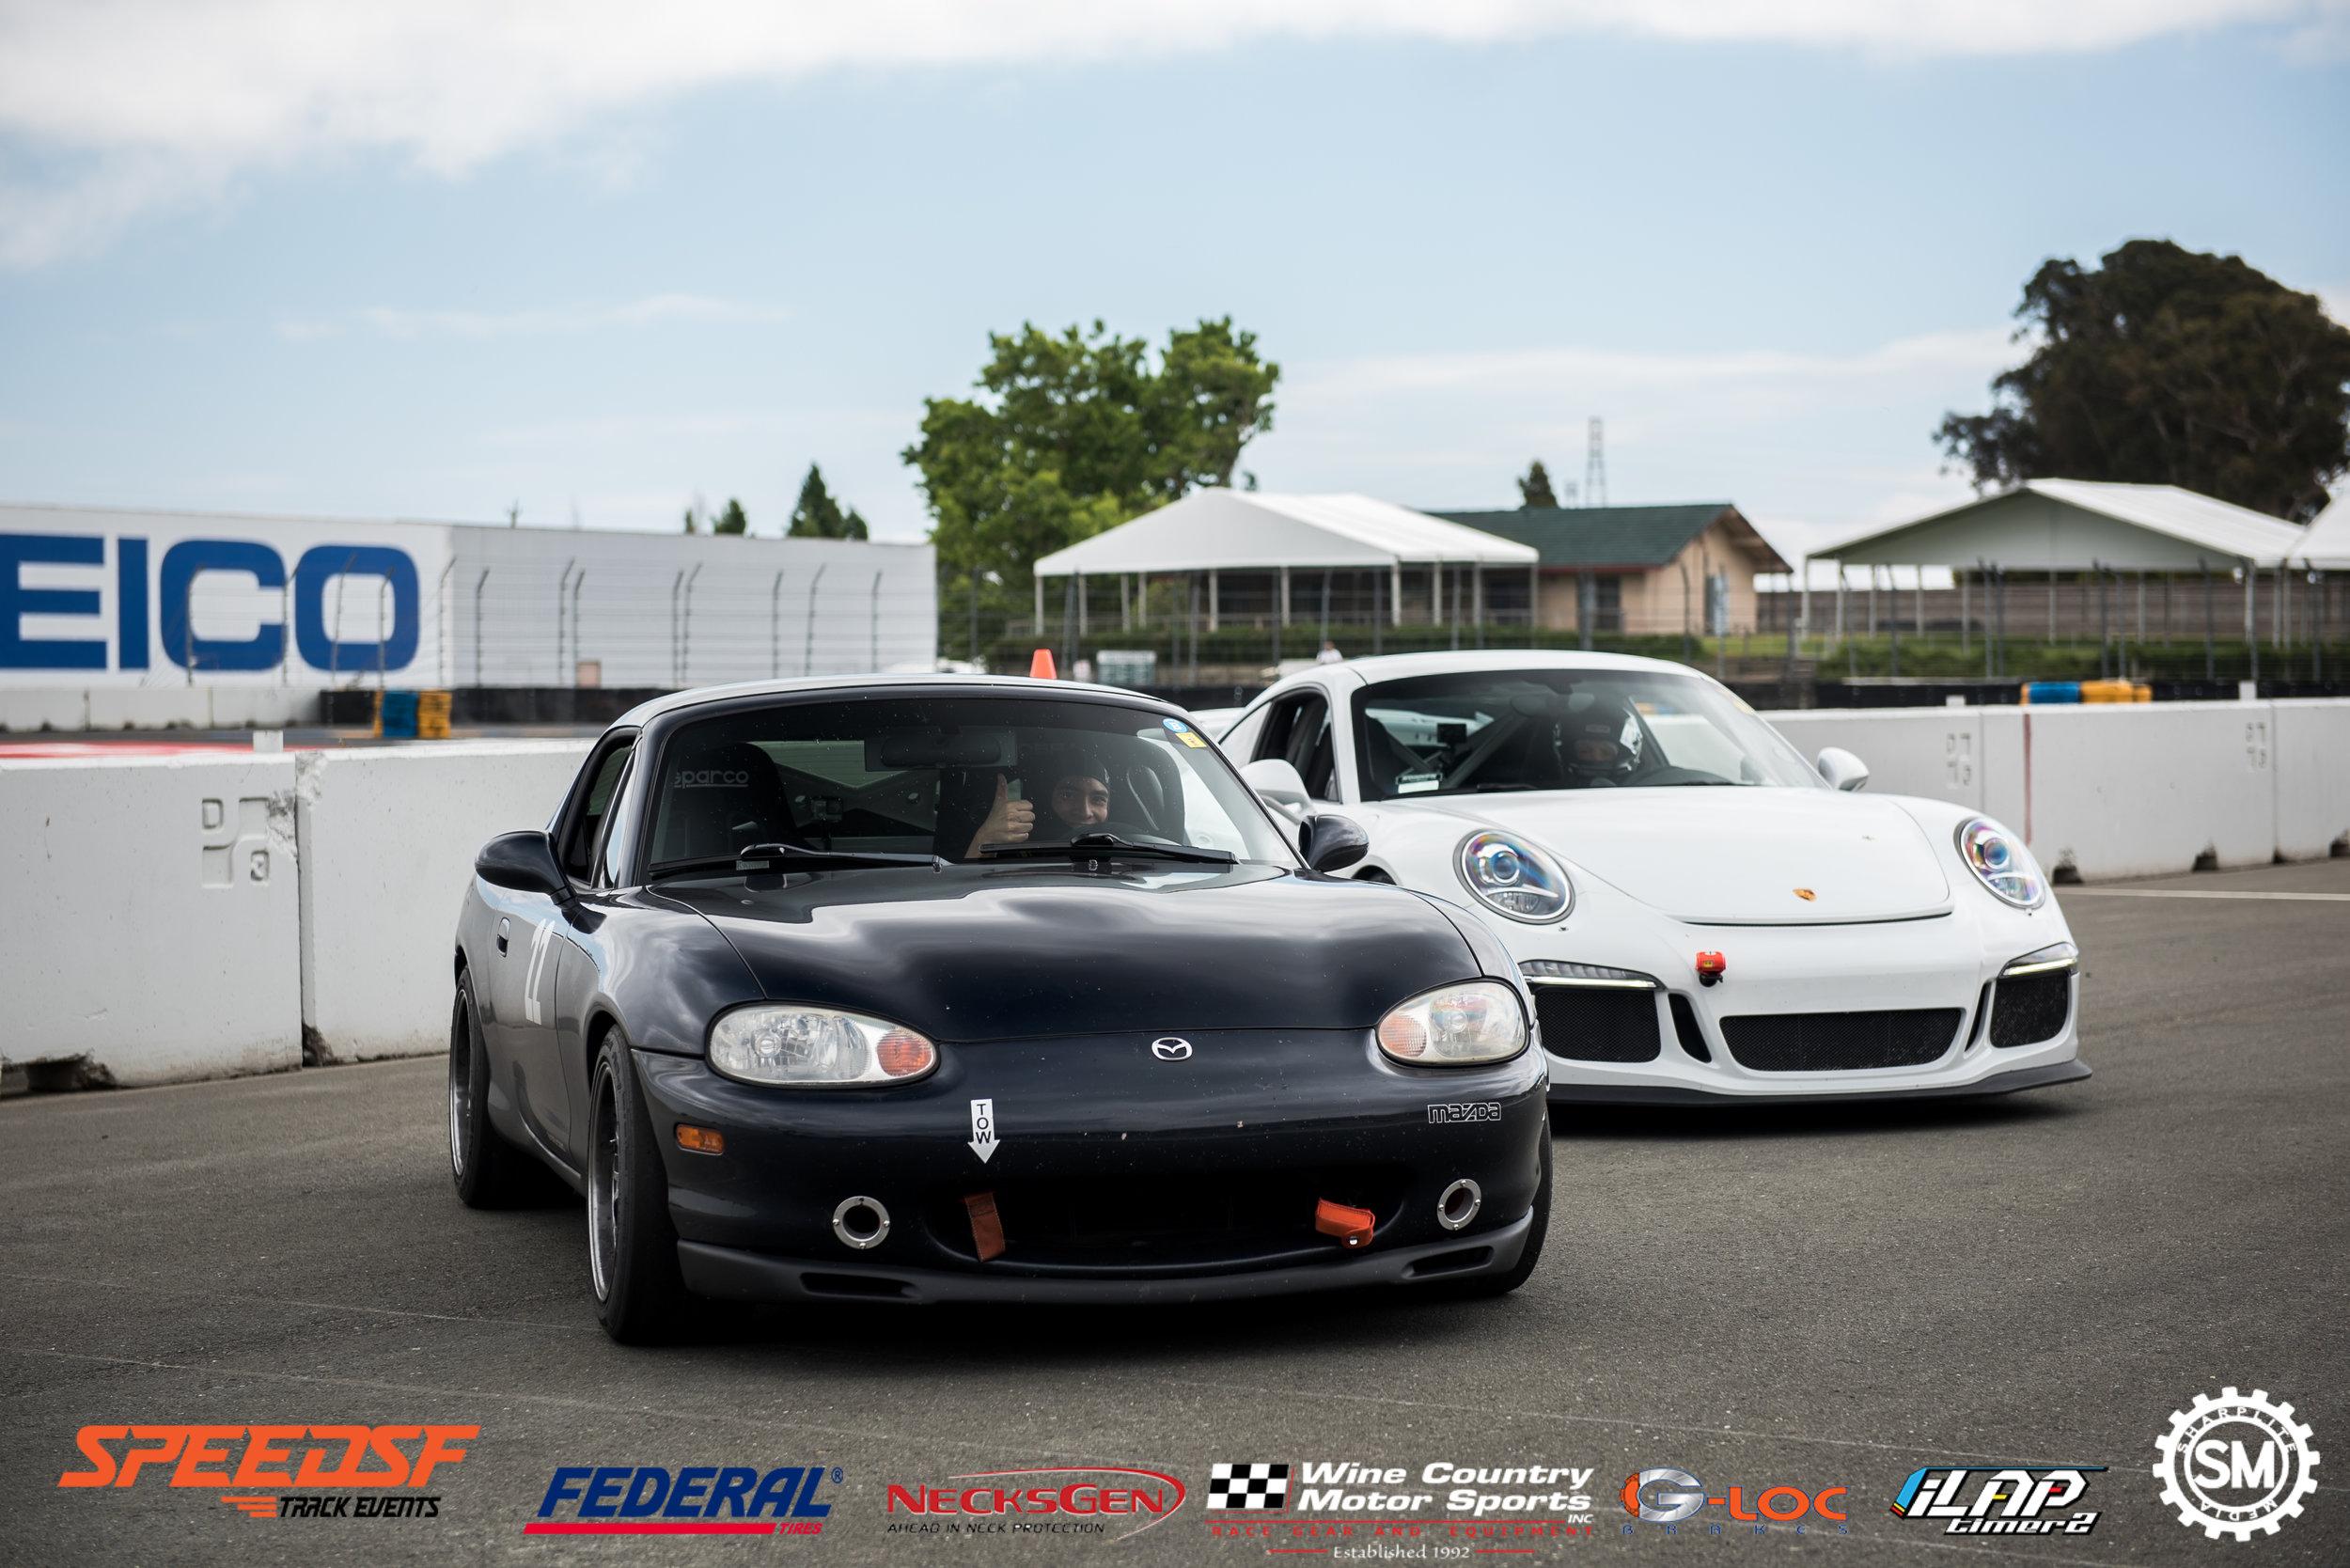 SpeedSF Saturday_-8.jpg